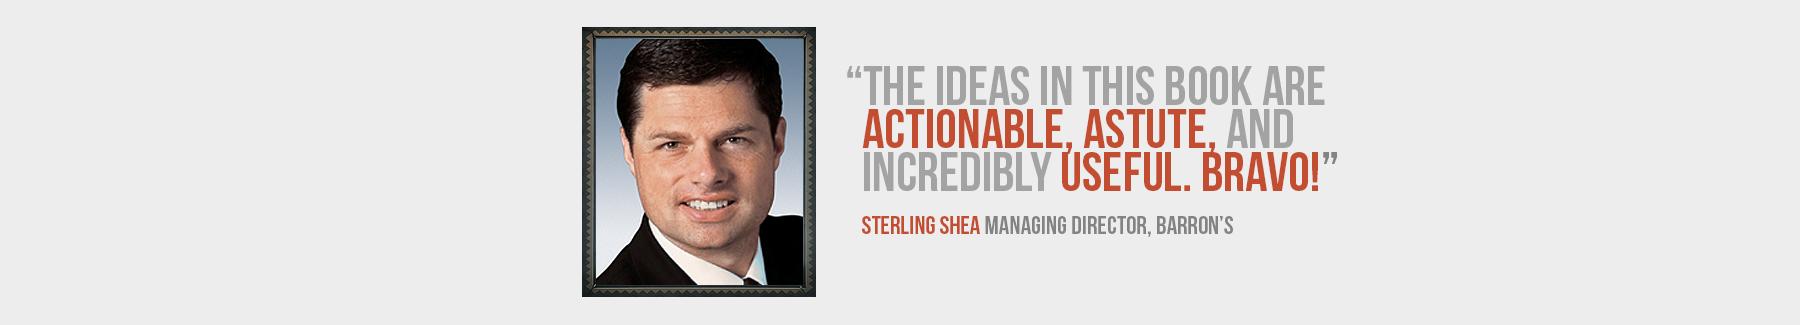 sterling shea